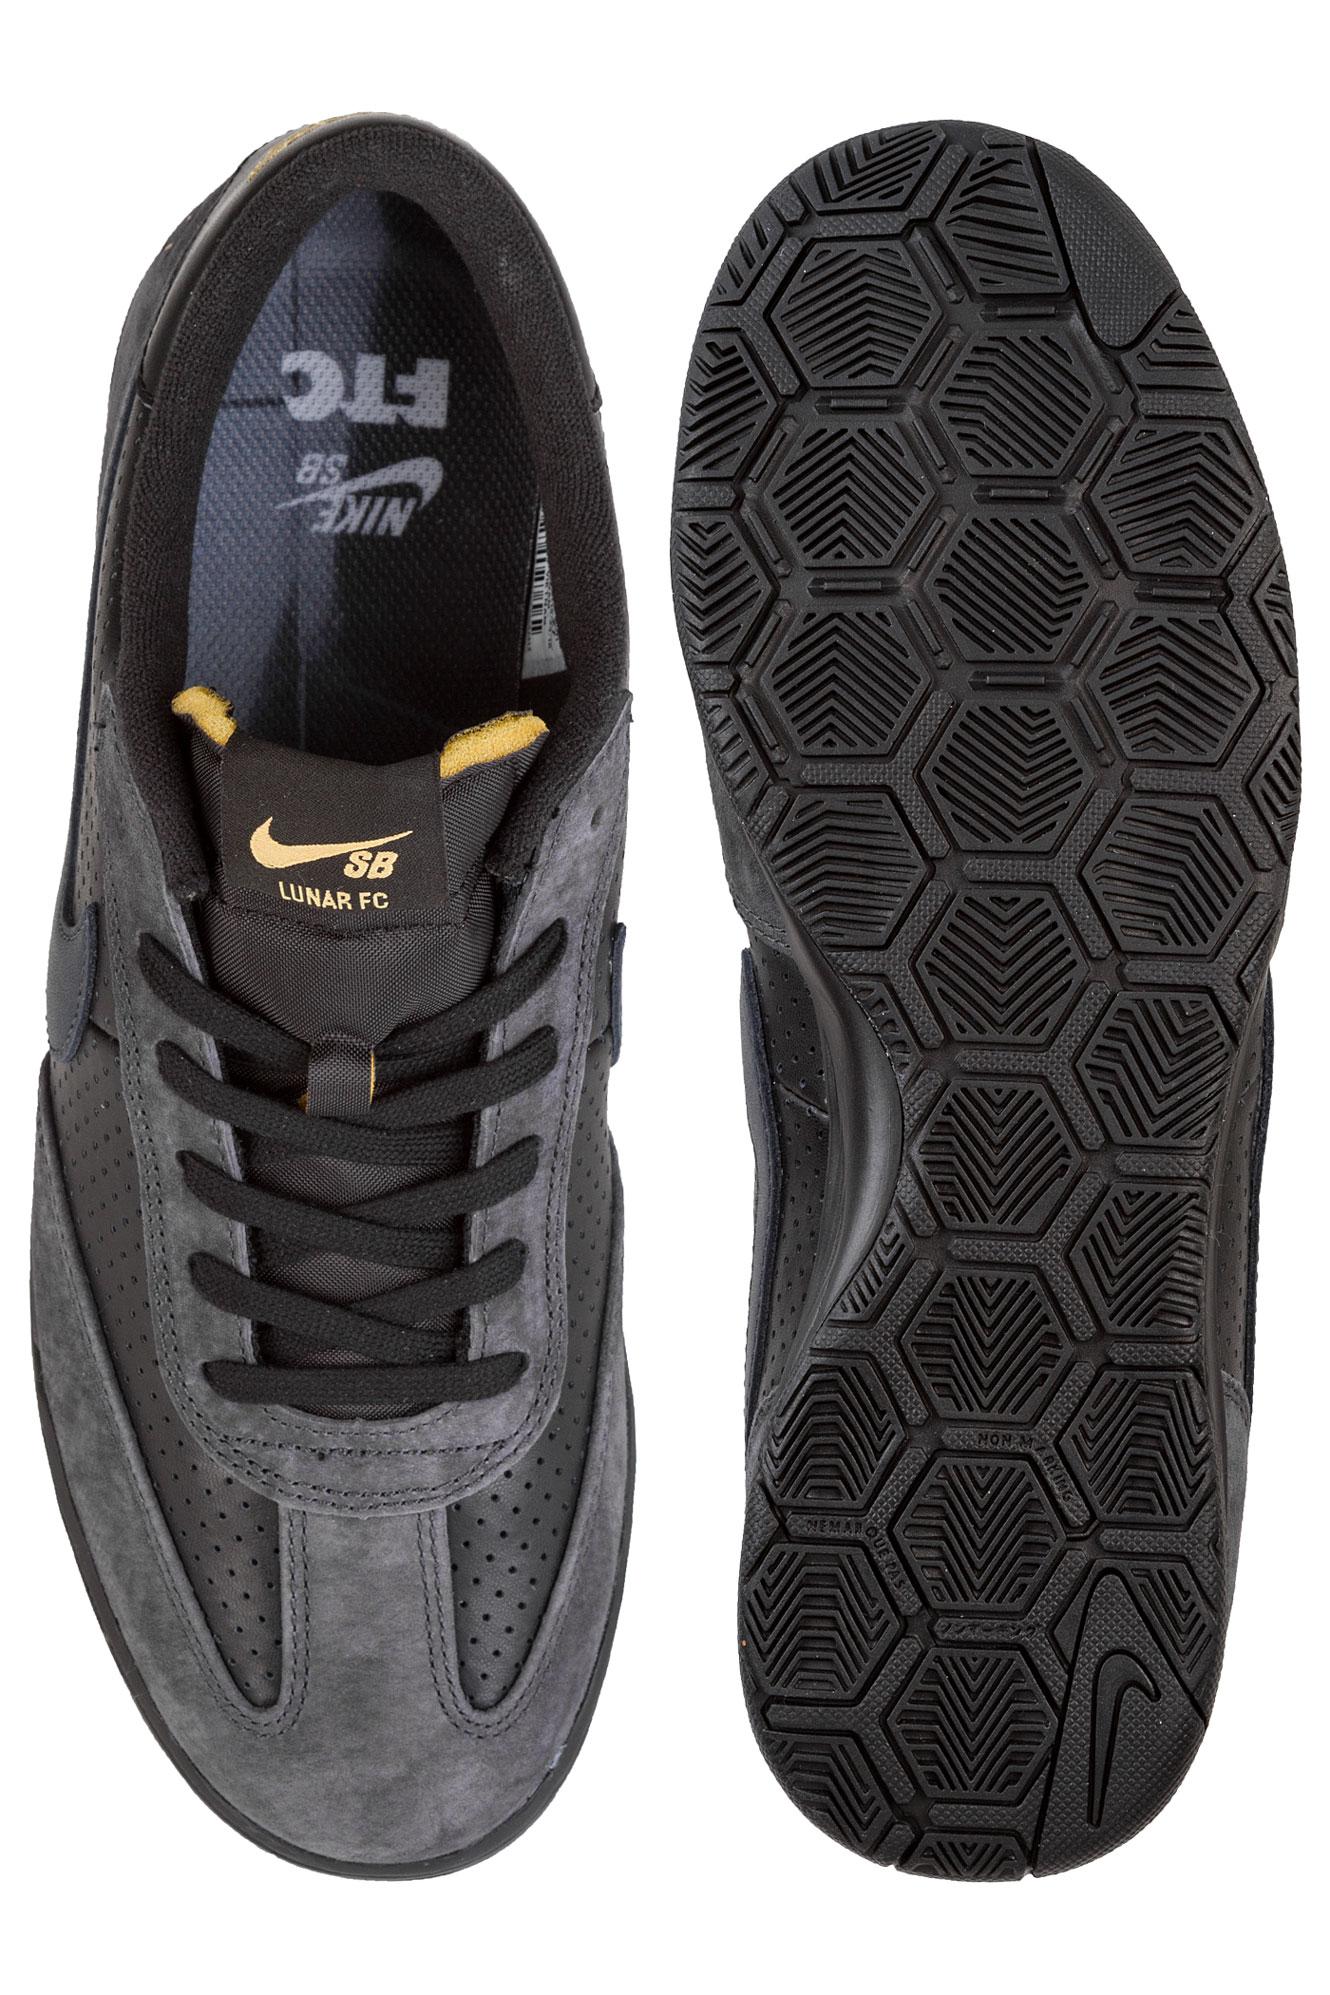 451ee4739f7c Nike SB x FTC Lunar FC Shoes (black anthracite metallic gold) ...